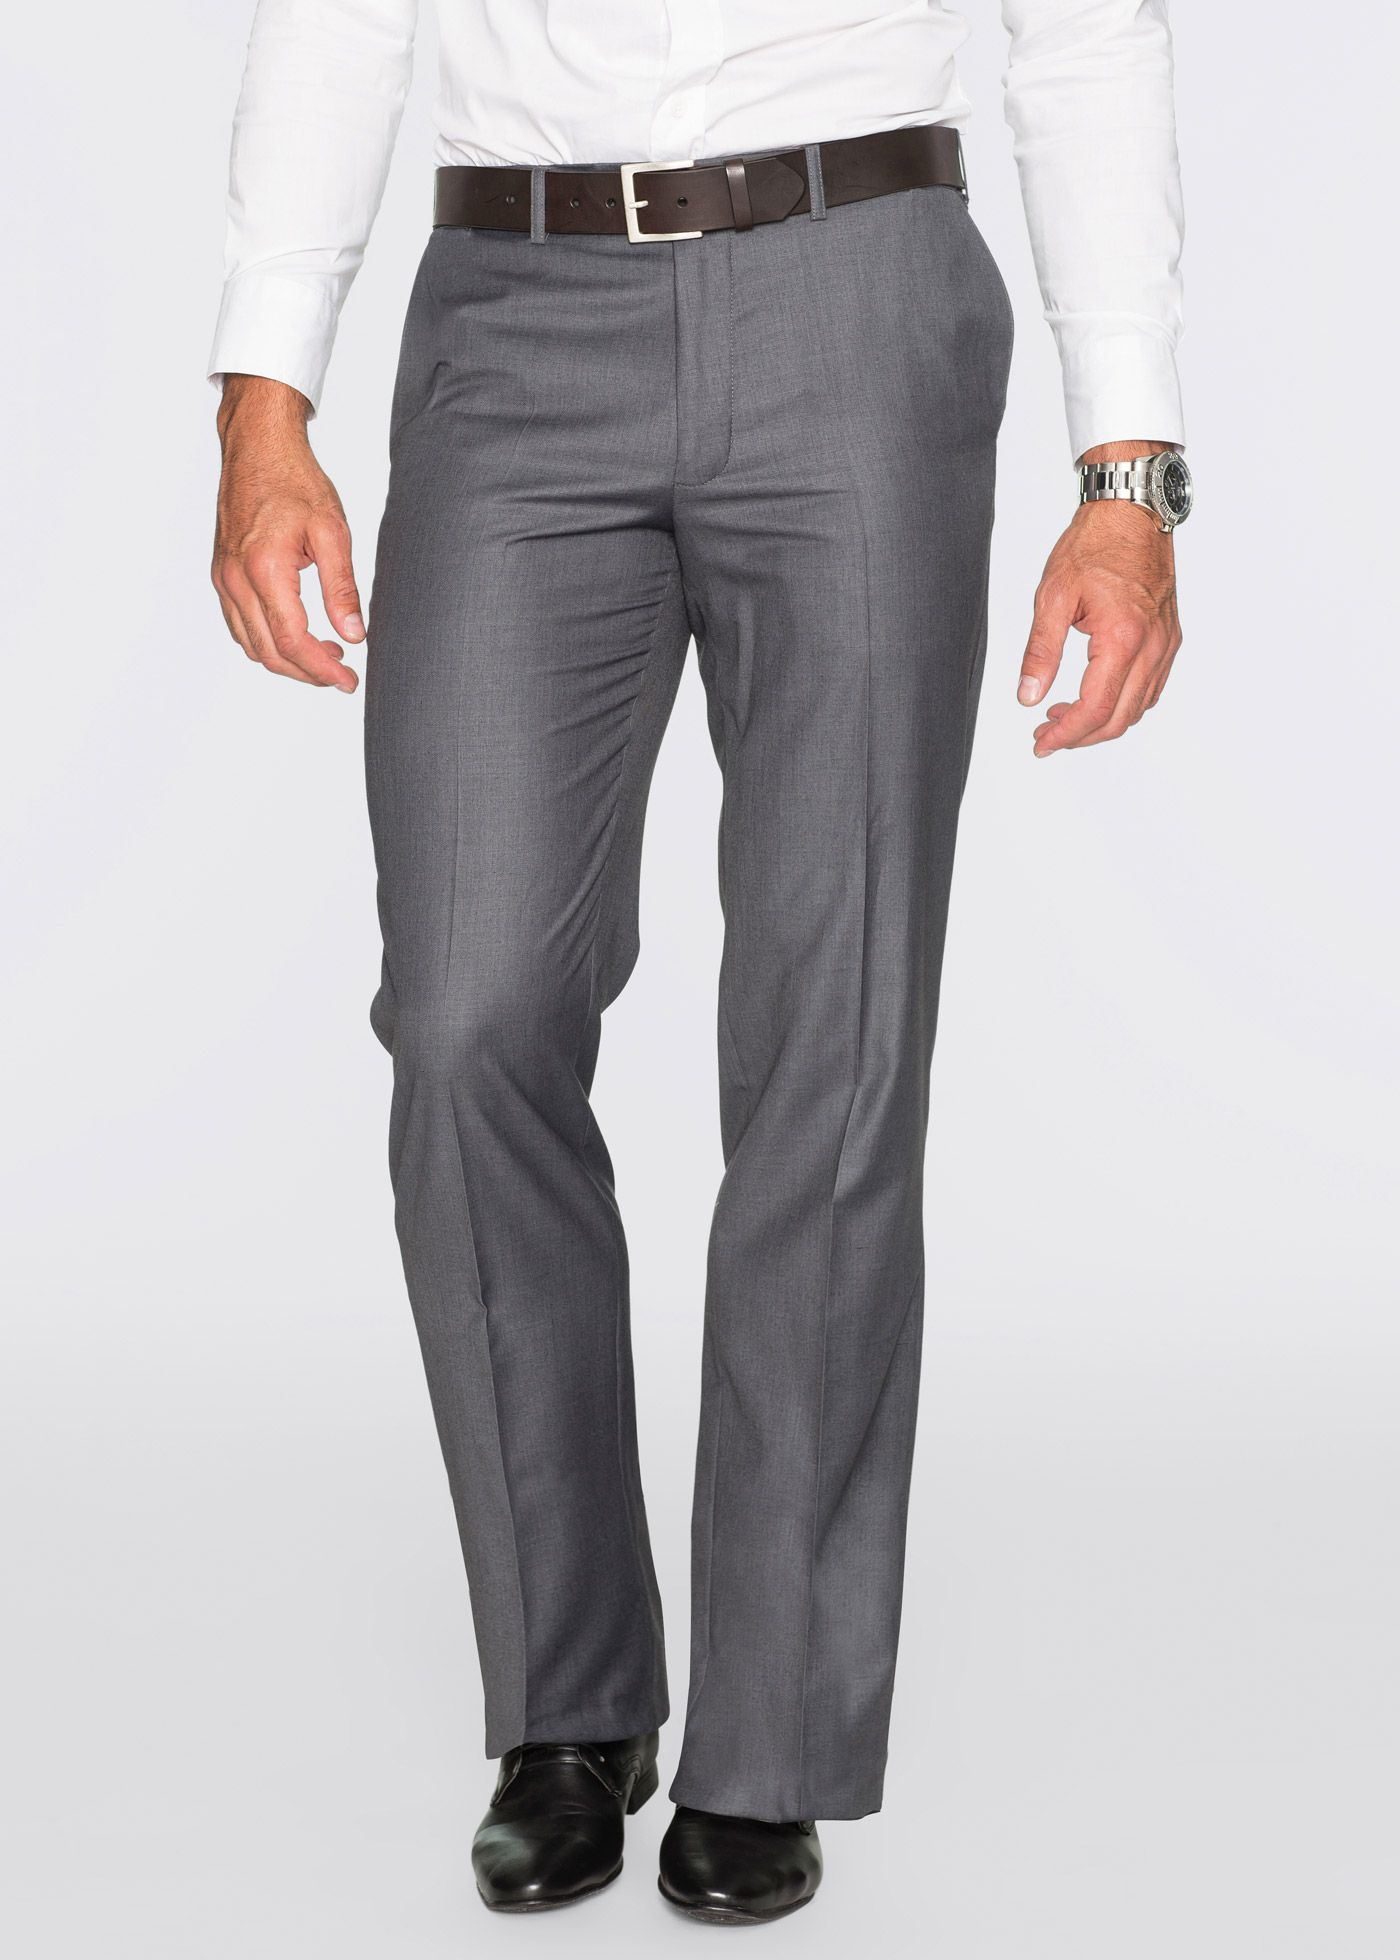 Baukasten-Hose, Regular Fit Straight, bpc selection, grau meliert